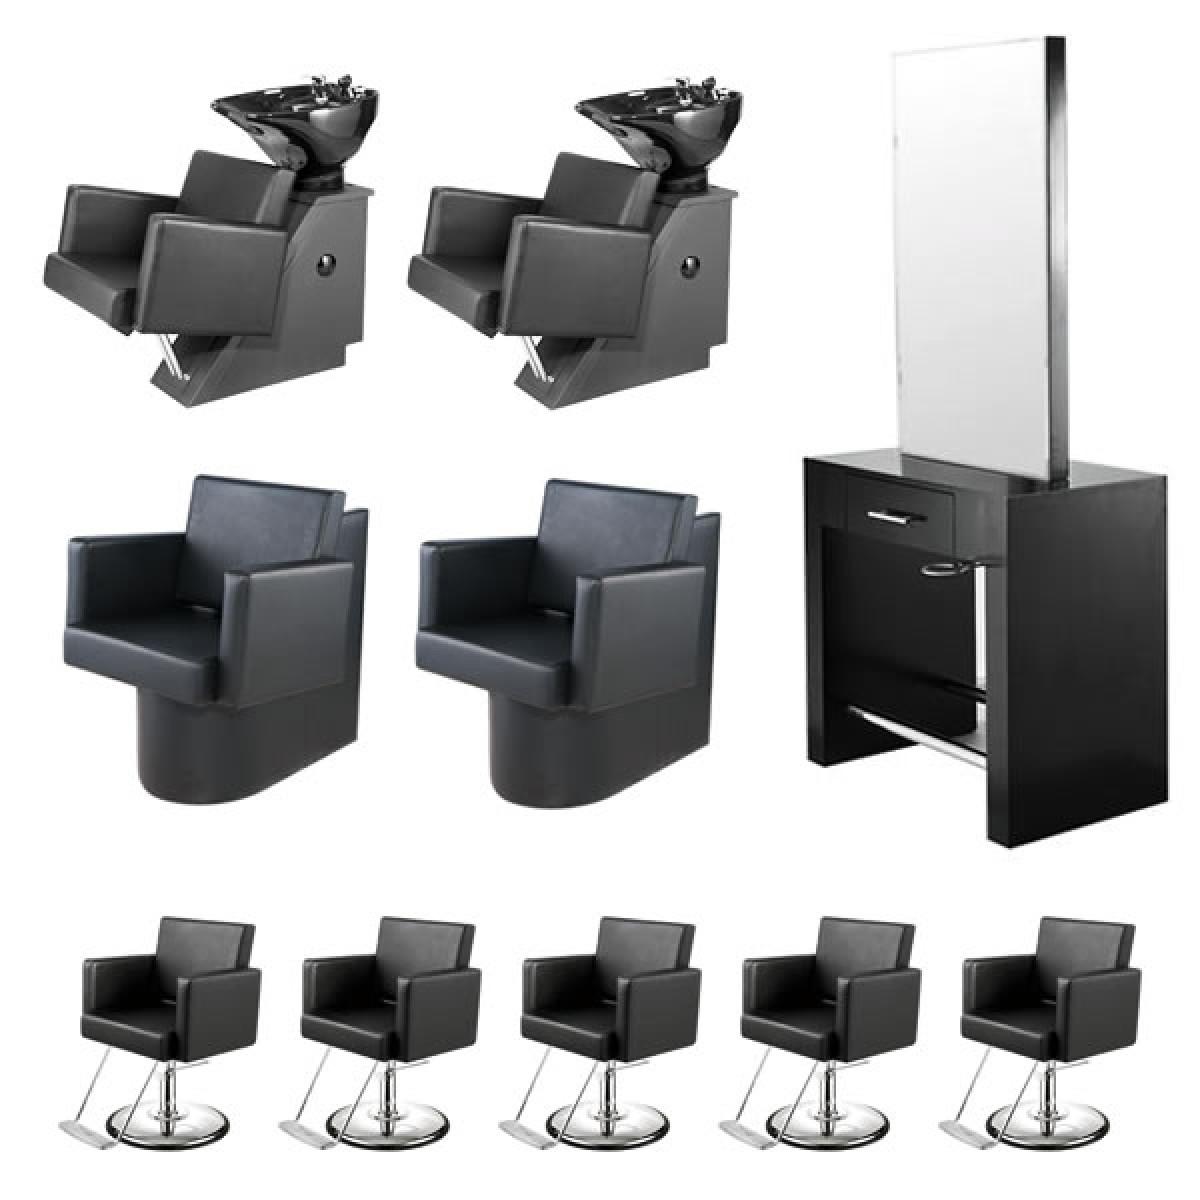 """CANON"" Salon Equipment Package, Salon Furniture Package, Wholesale Salon Equipment"